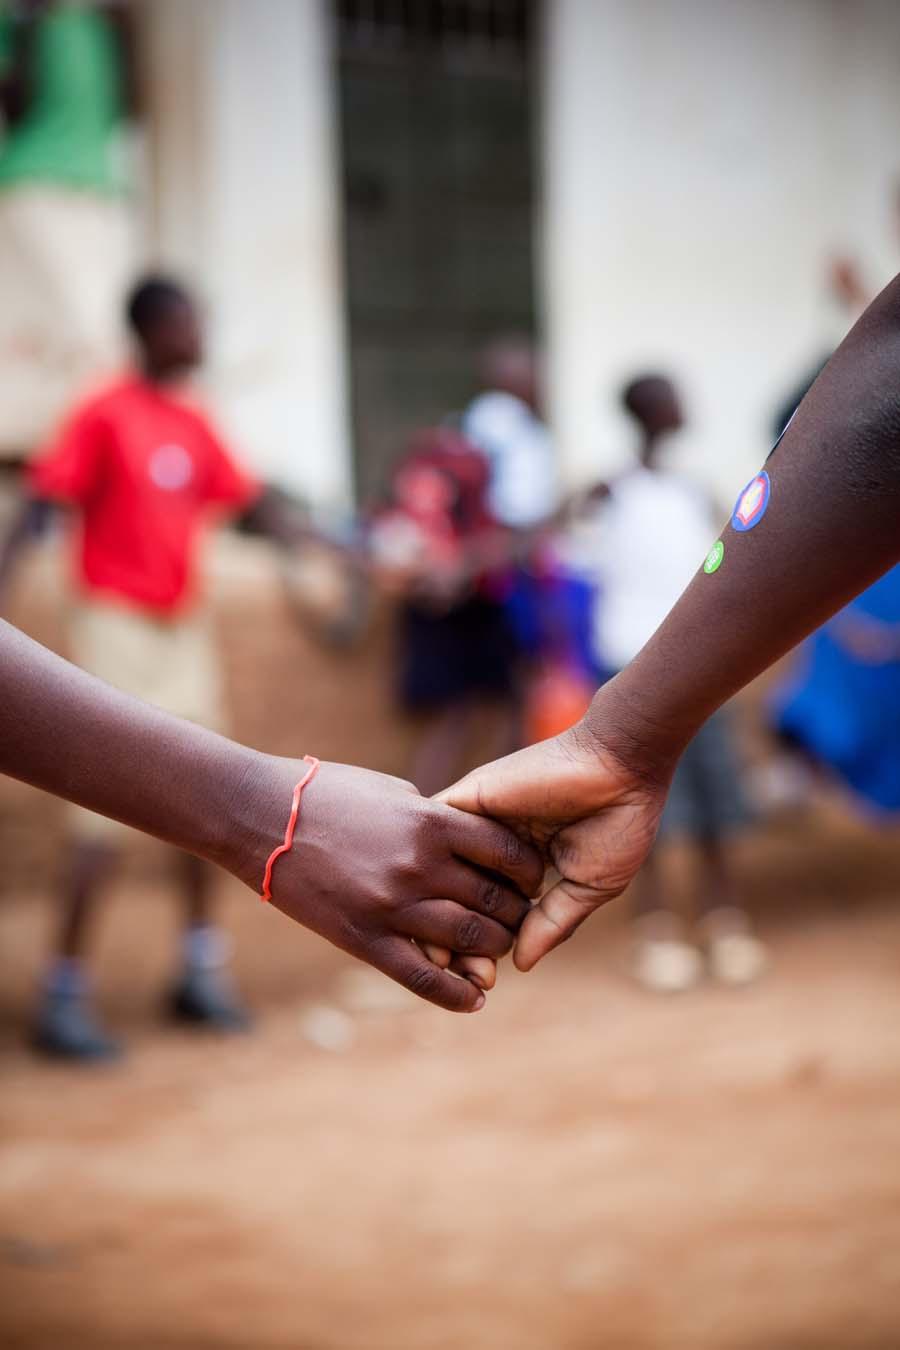 jessicadavisphotography.com | Jessica Davis Photography | Portrait Work in Uganda| Travel Photographer | World Event Photographs 8 (2).jpg